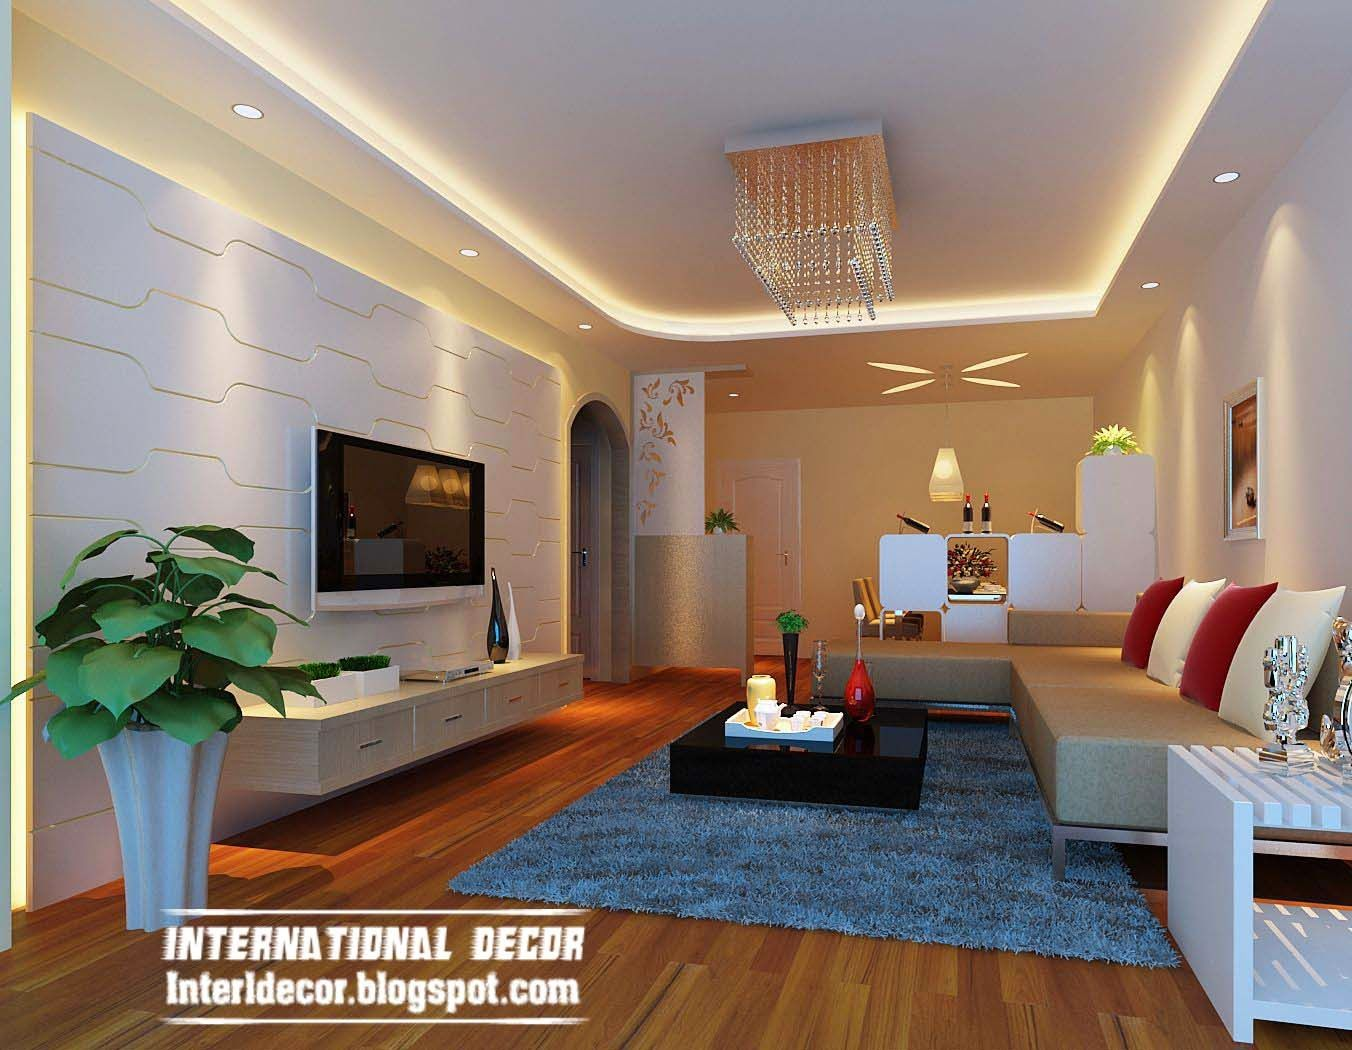 Suspended Ceiling Pop Design Lighting For Living Room Interior Wall Paneling 2014 Jpg 1 Ceiling Design Bedroom Living Room Lighting Ceiling Lights Living Room #small #living #room #lights